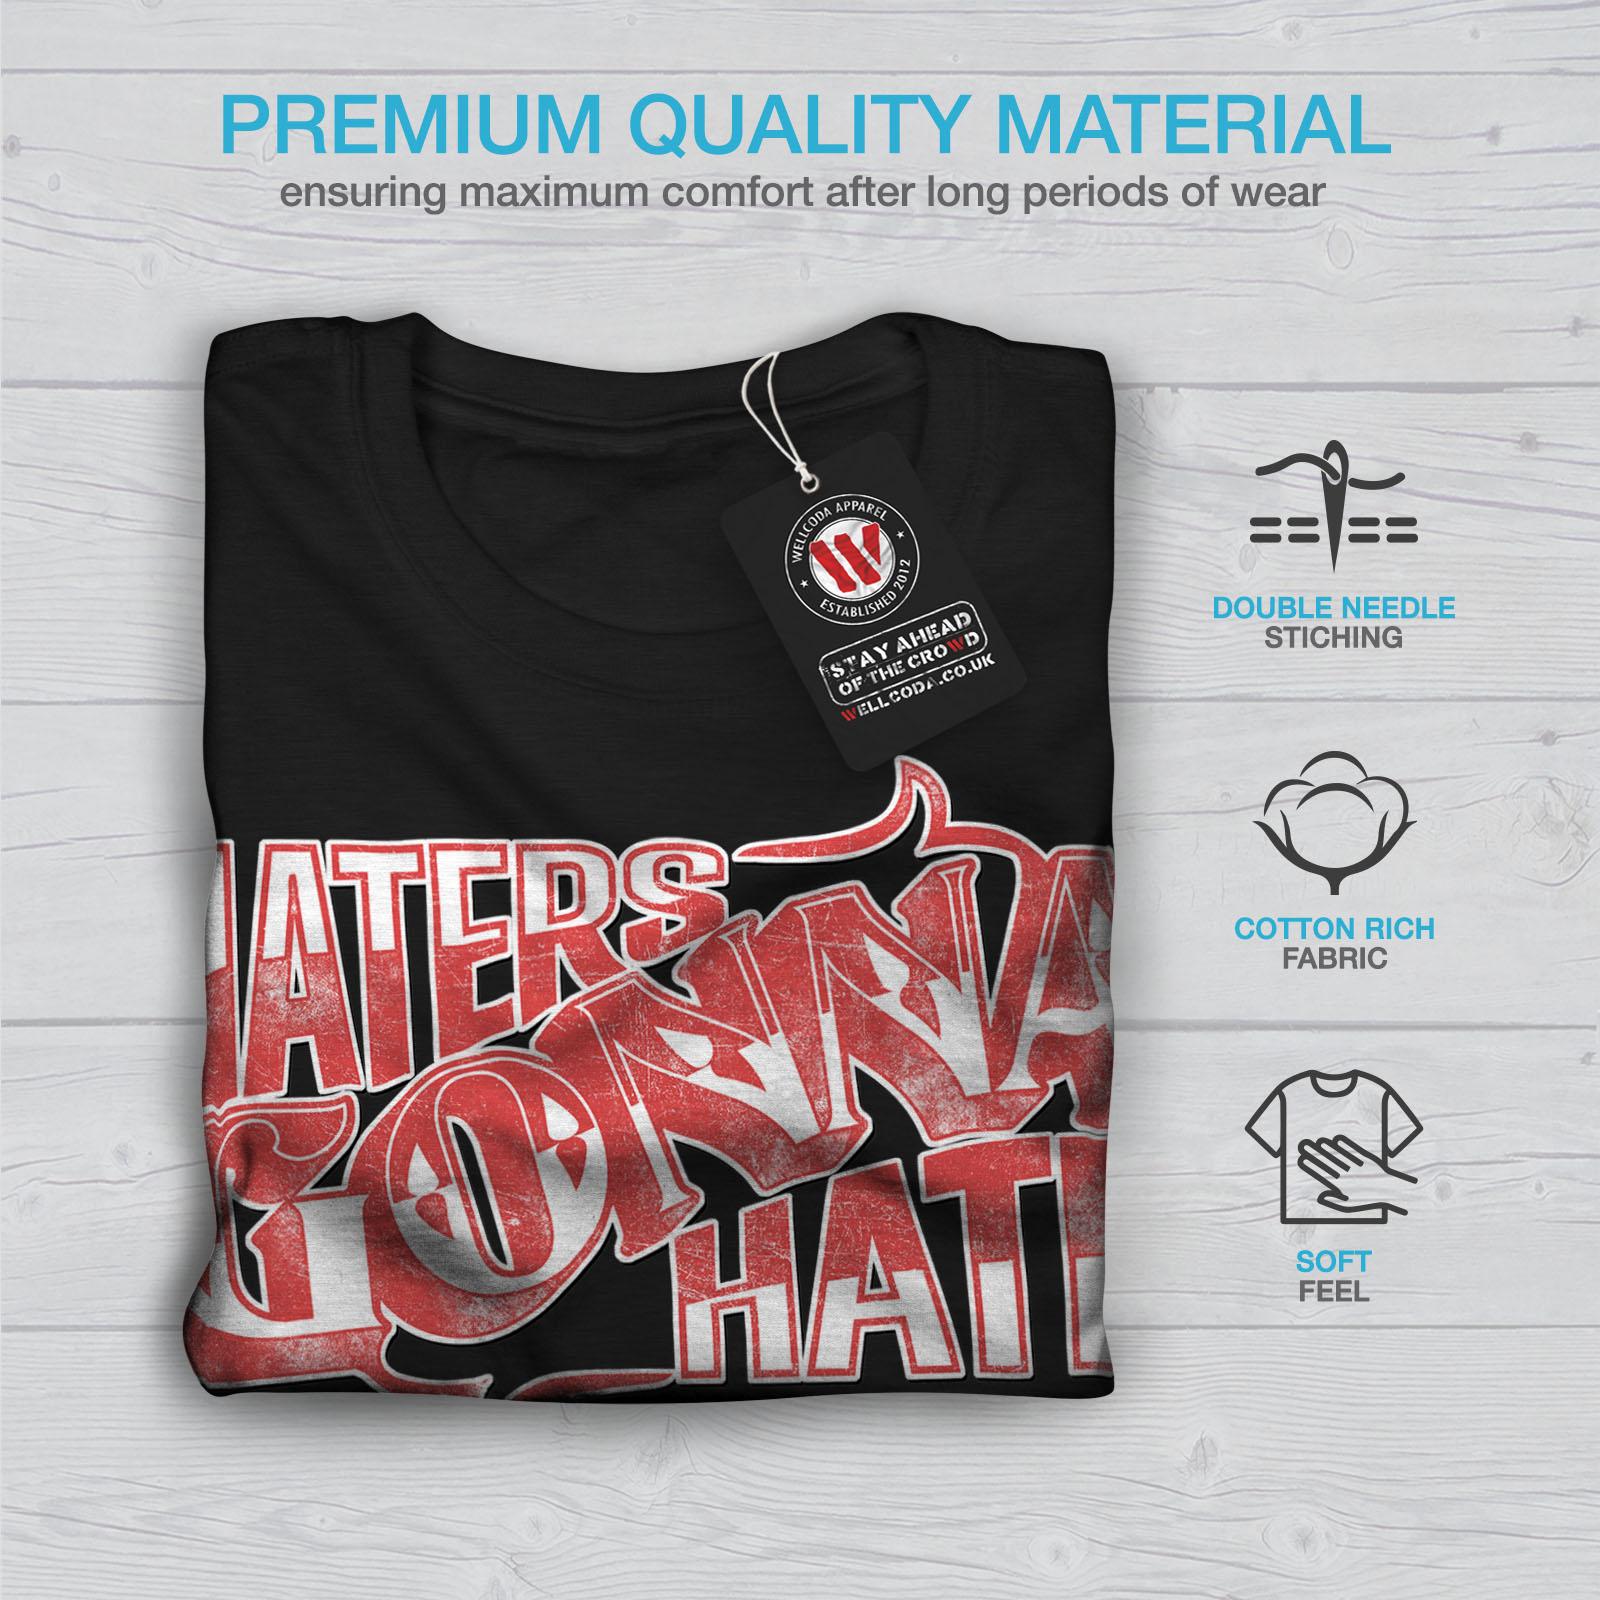 Wellcoda-Wasser-hassen-Zitat-Slogan-Herren-T-Shirt-True-Grafikdesign-Printed-Tee Indexbild 7